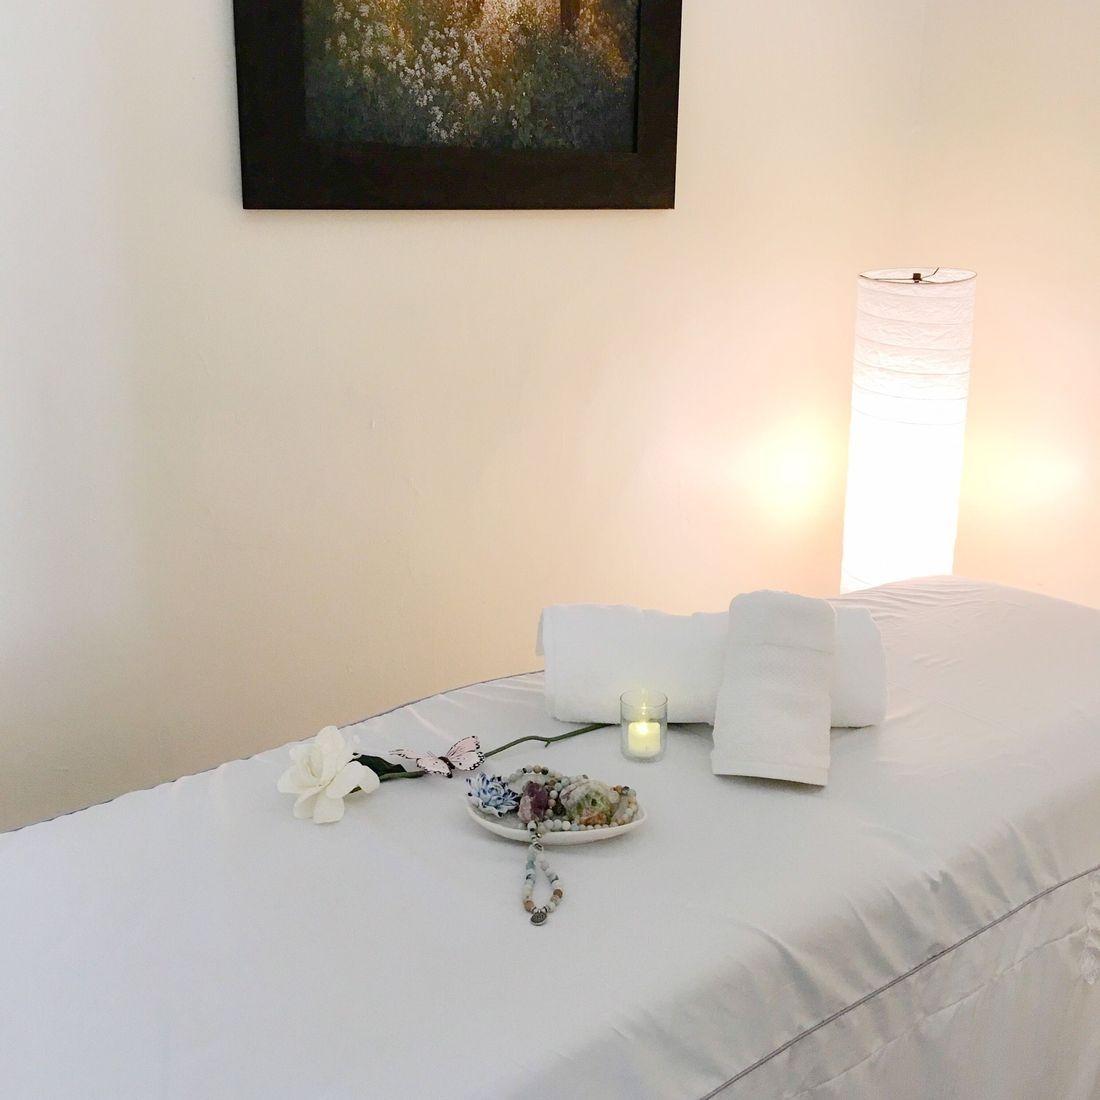 Energy Healing, reiki, earth's healings, metaphysical, new age, natural healing, holistic, river edge nj